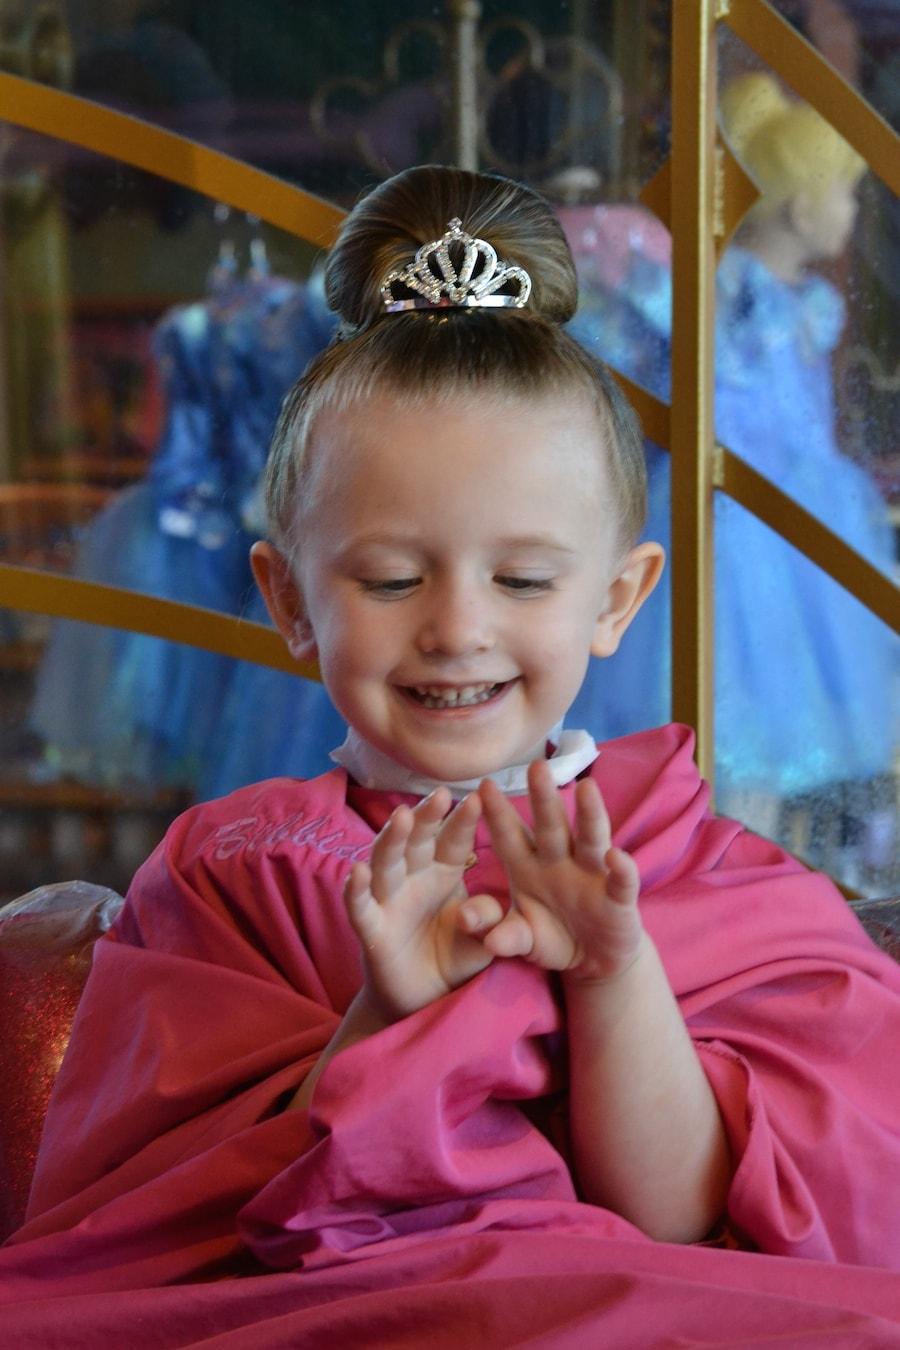 Princess Perfection at Bibbidi Bobbidi Boutique at Downtown Disney at Walt Disney World Resort